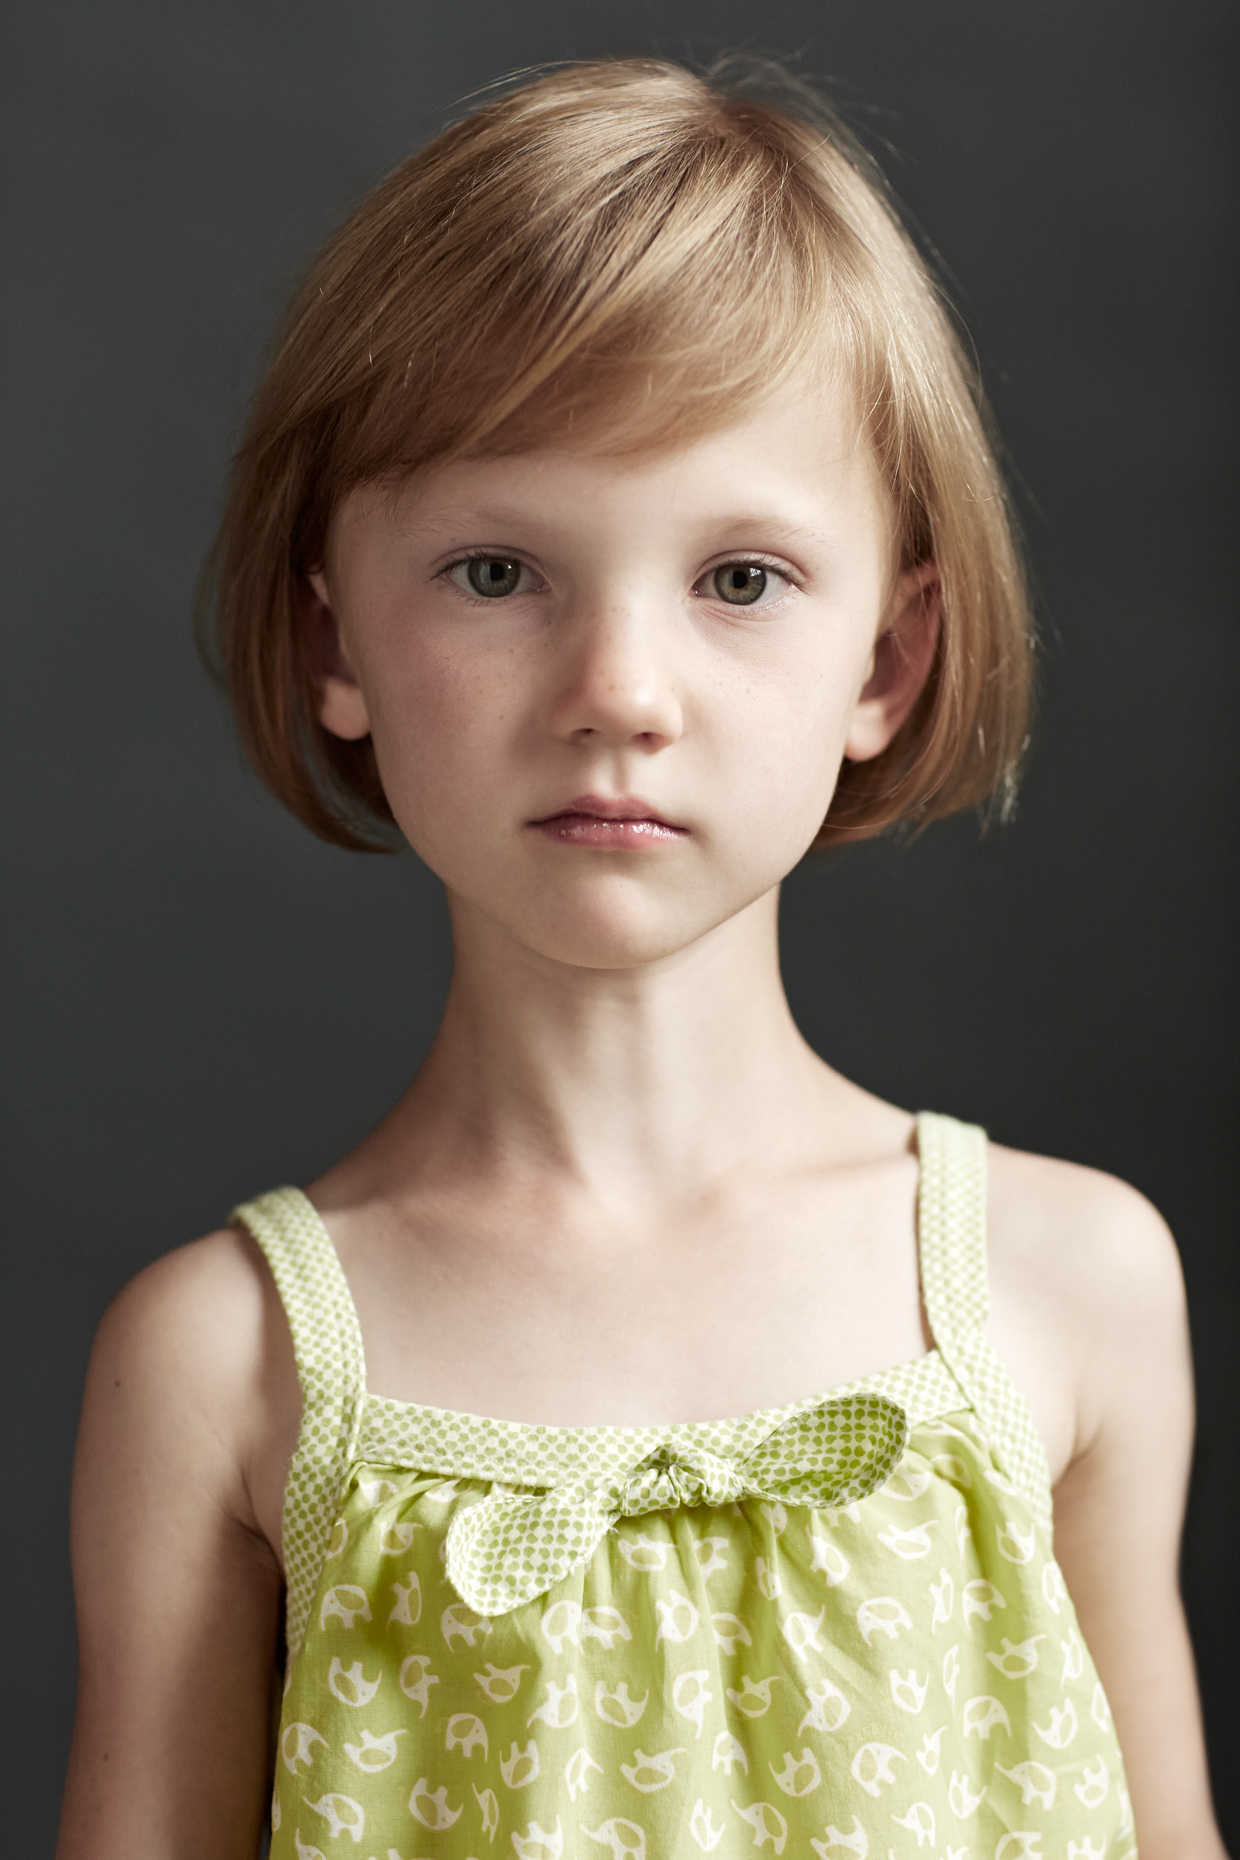 Portrait Photography Derek Israelsen Kid Headshot